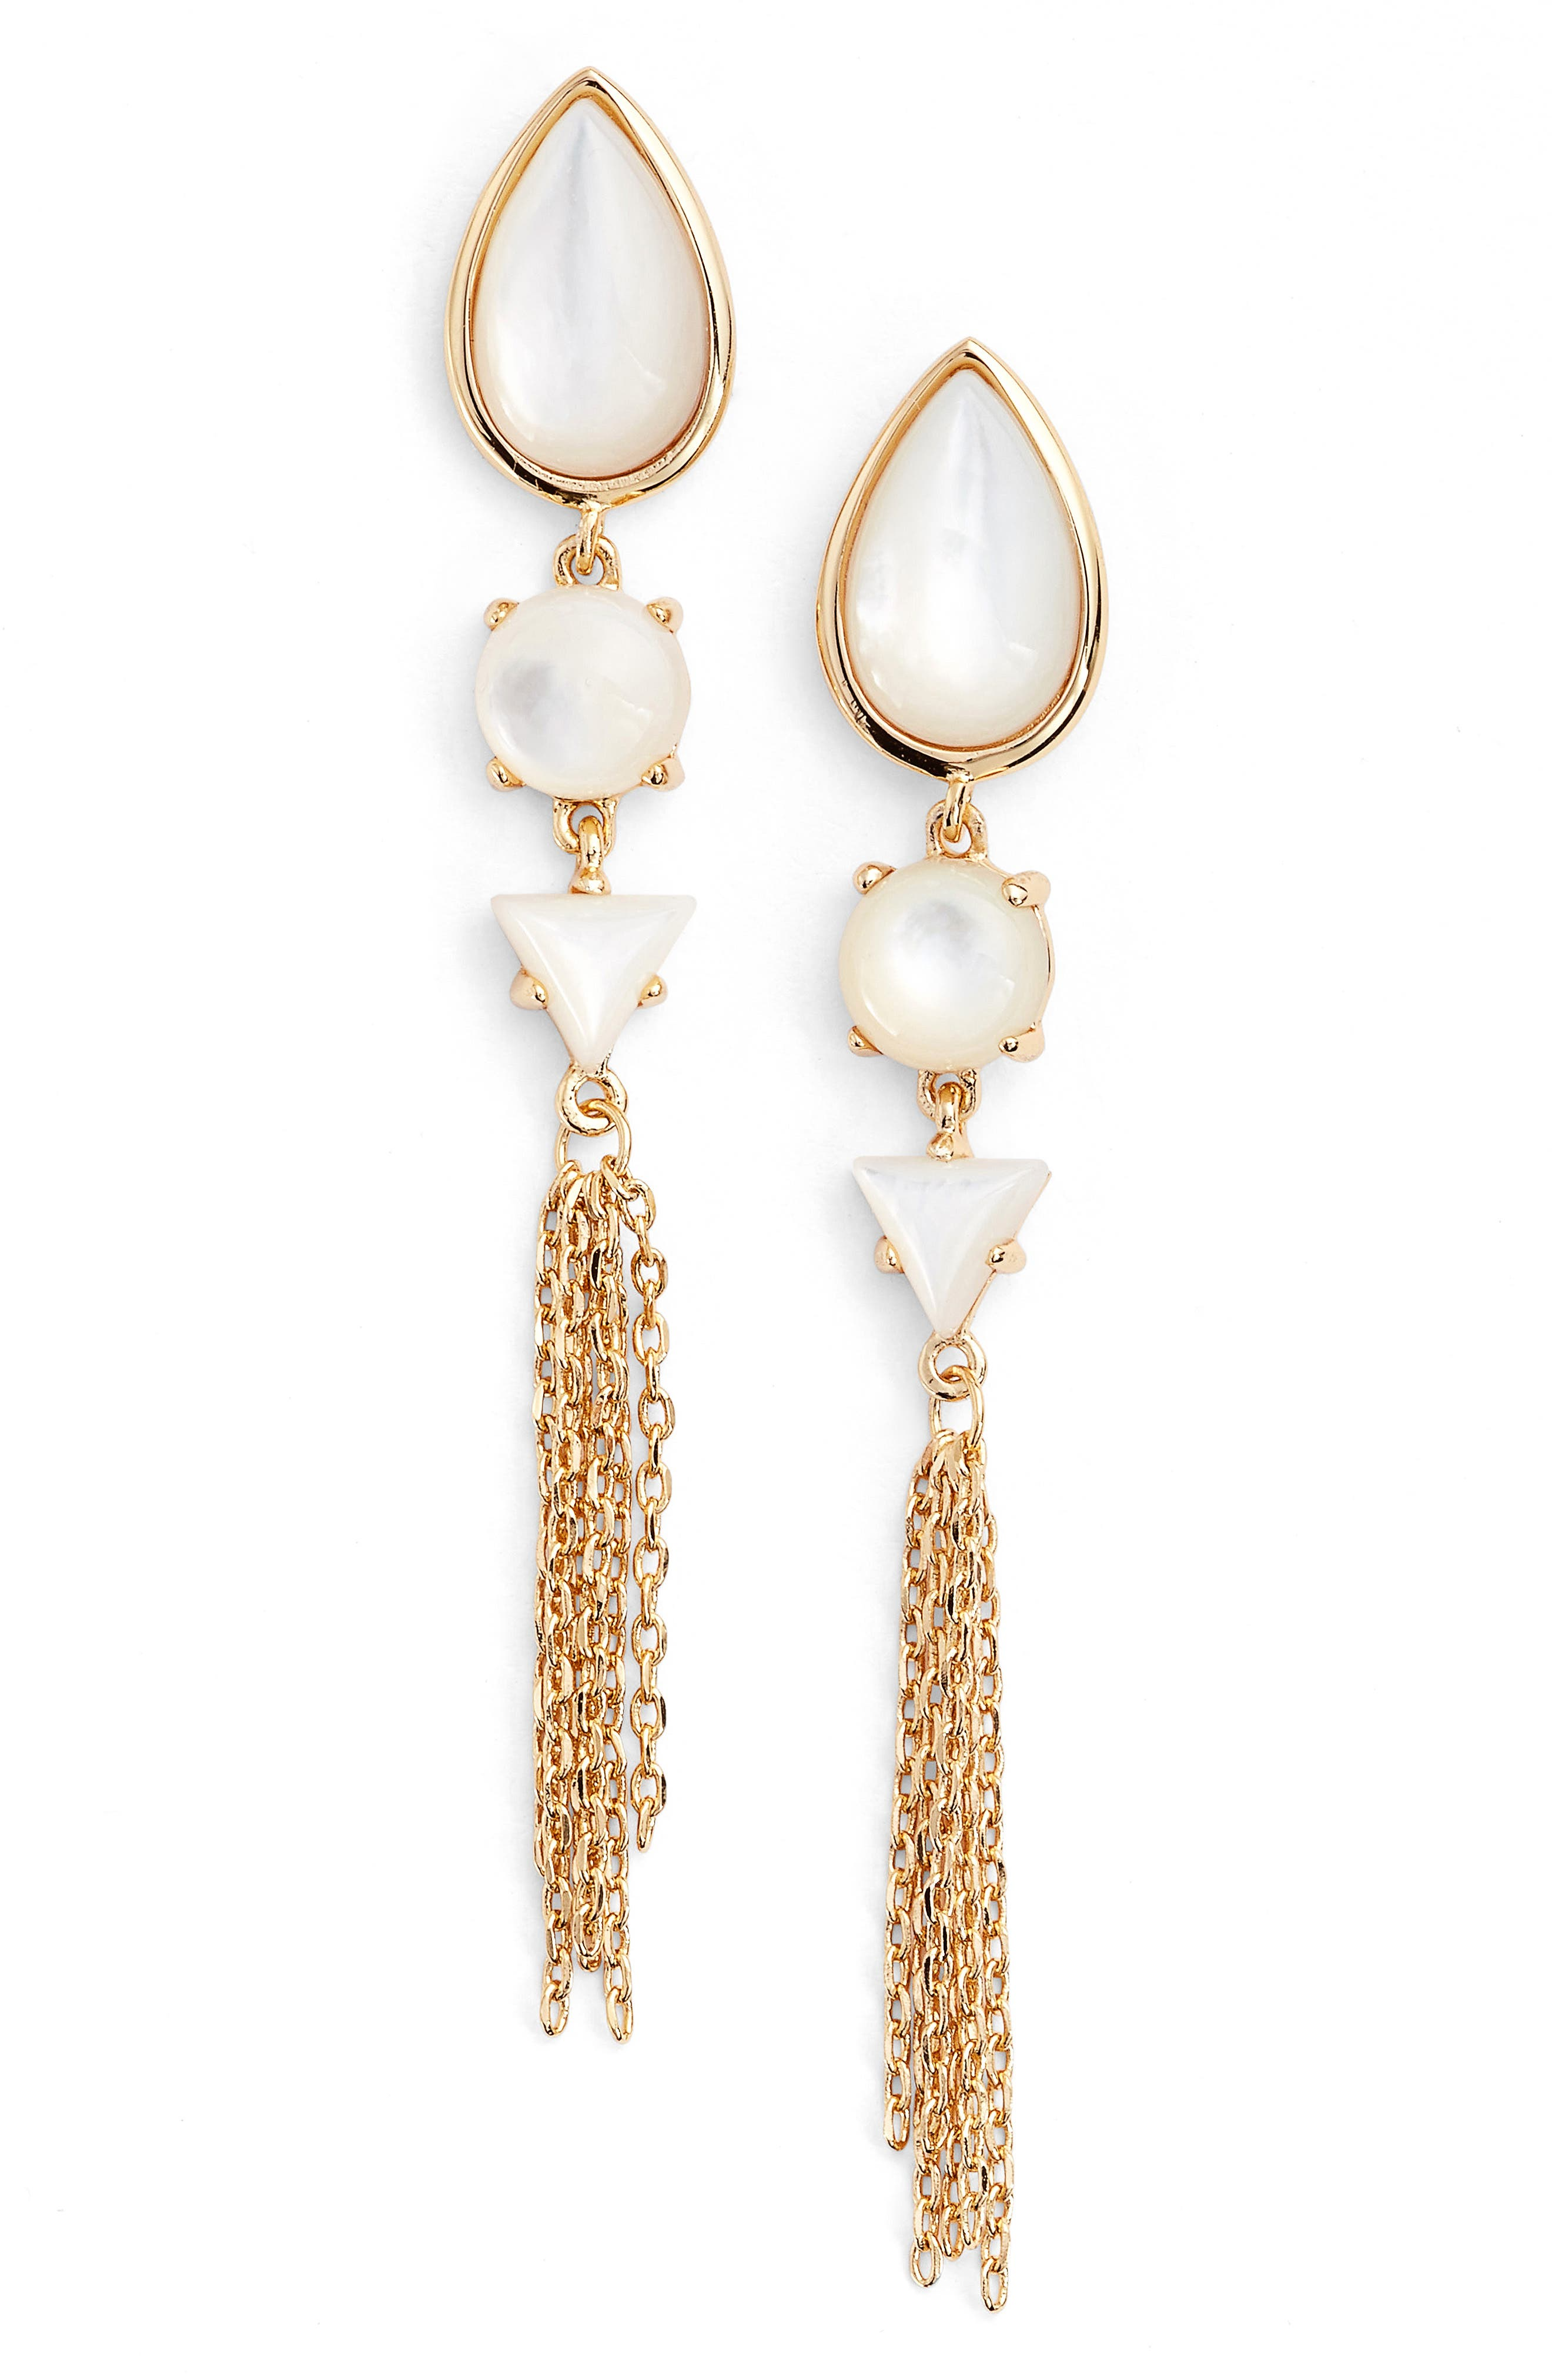 Jules Smith Willow Drop Earrings